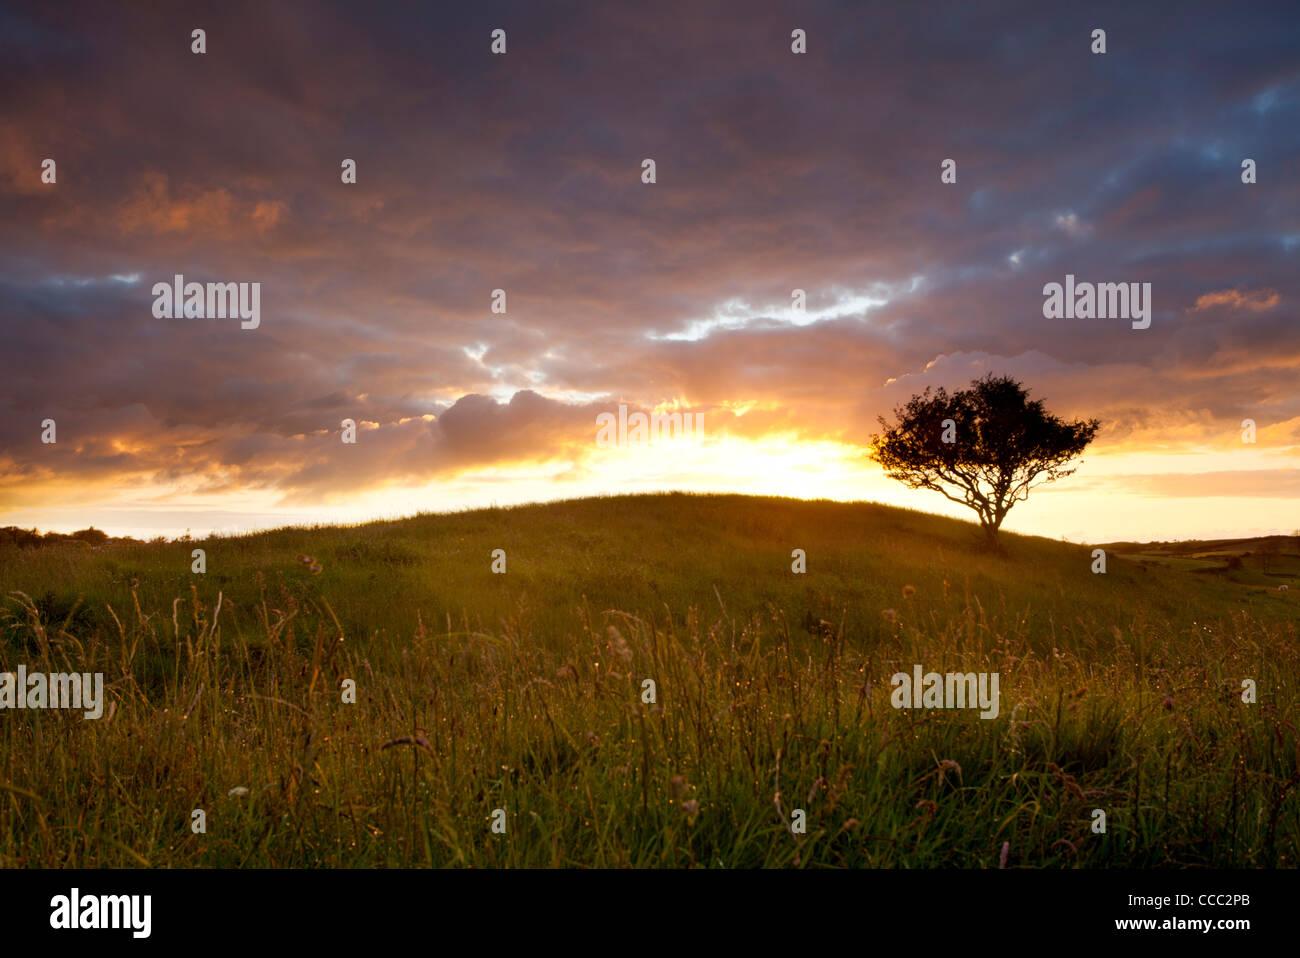 Einsamer Baum bei Sonnenuntergang, County Mayo, Irland. Stockbild